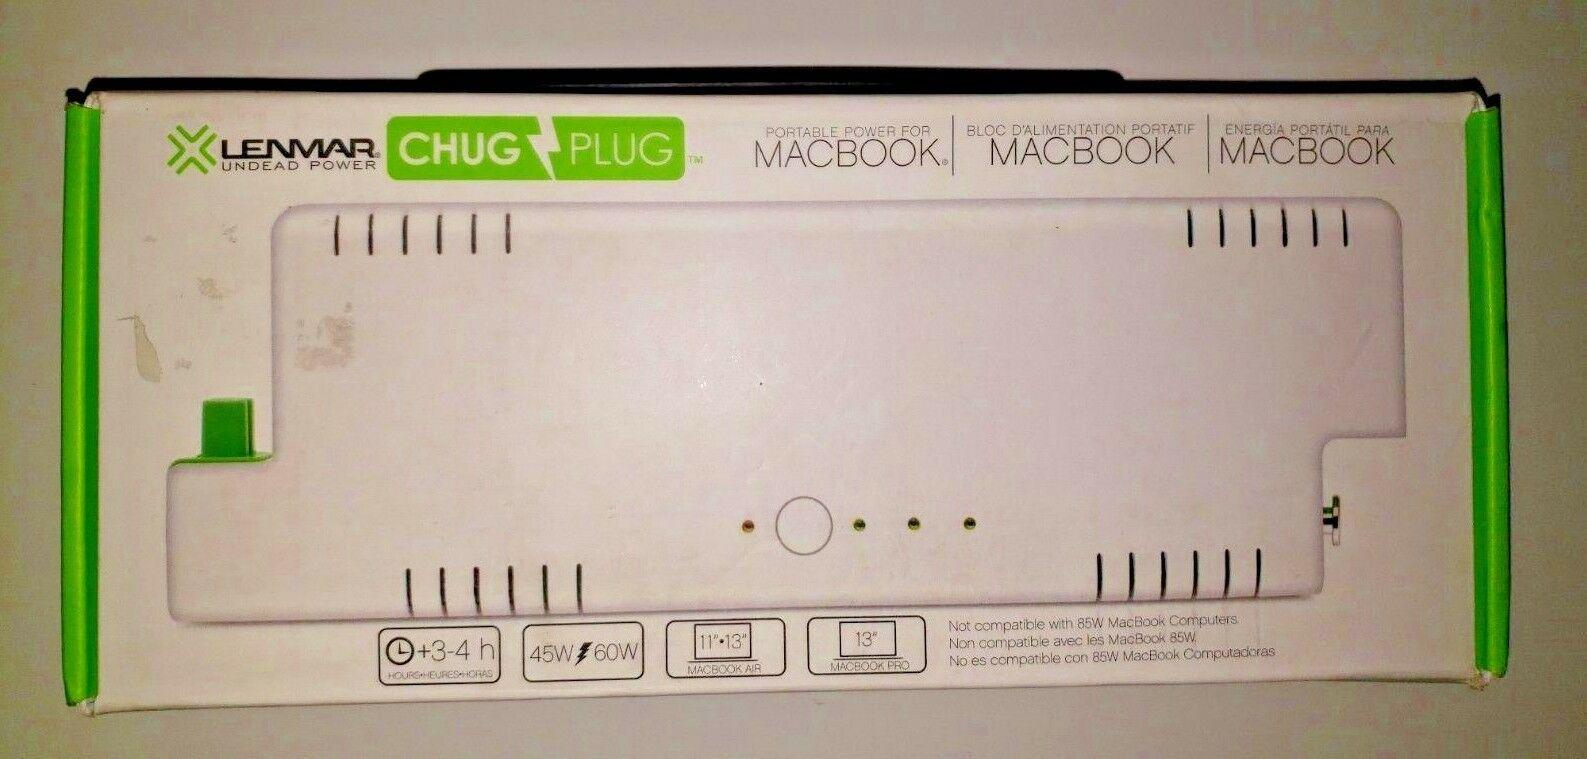 Lenmar Undead Power Chug Plug Apple Macbook Portable Power Charger PPWMB65